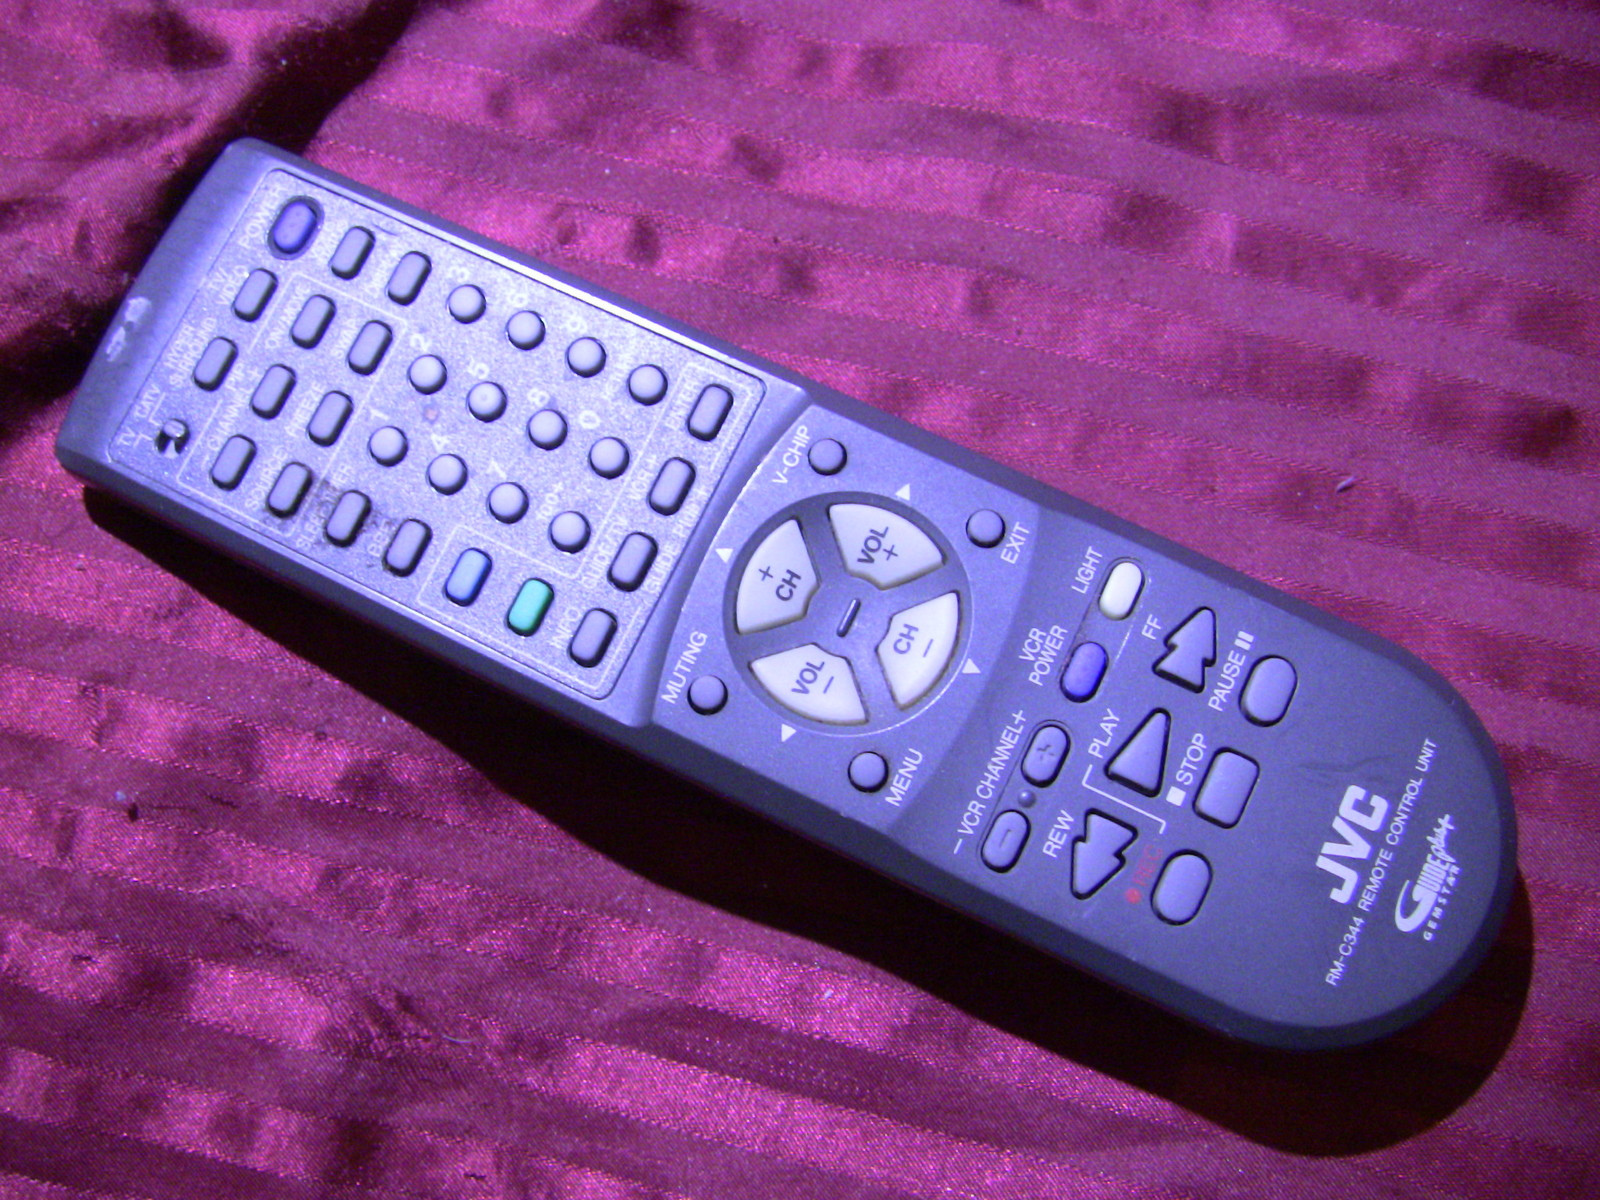 Original TV Remote RM-C344 AV27D800, AV32D800, AV32D8001, AV36D800, AV36D8000